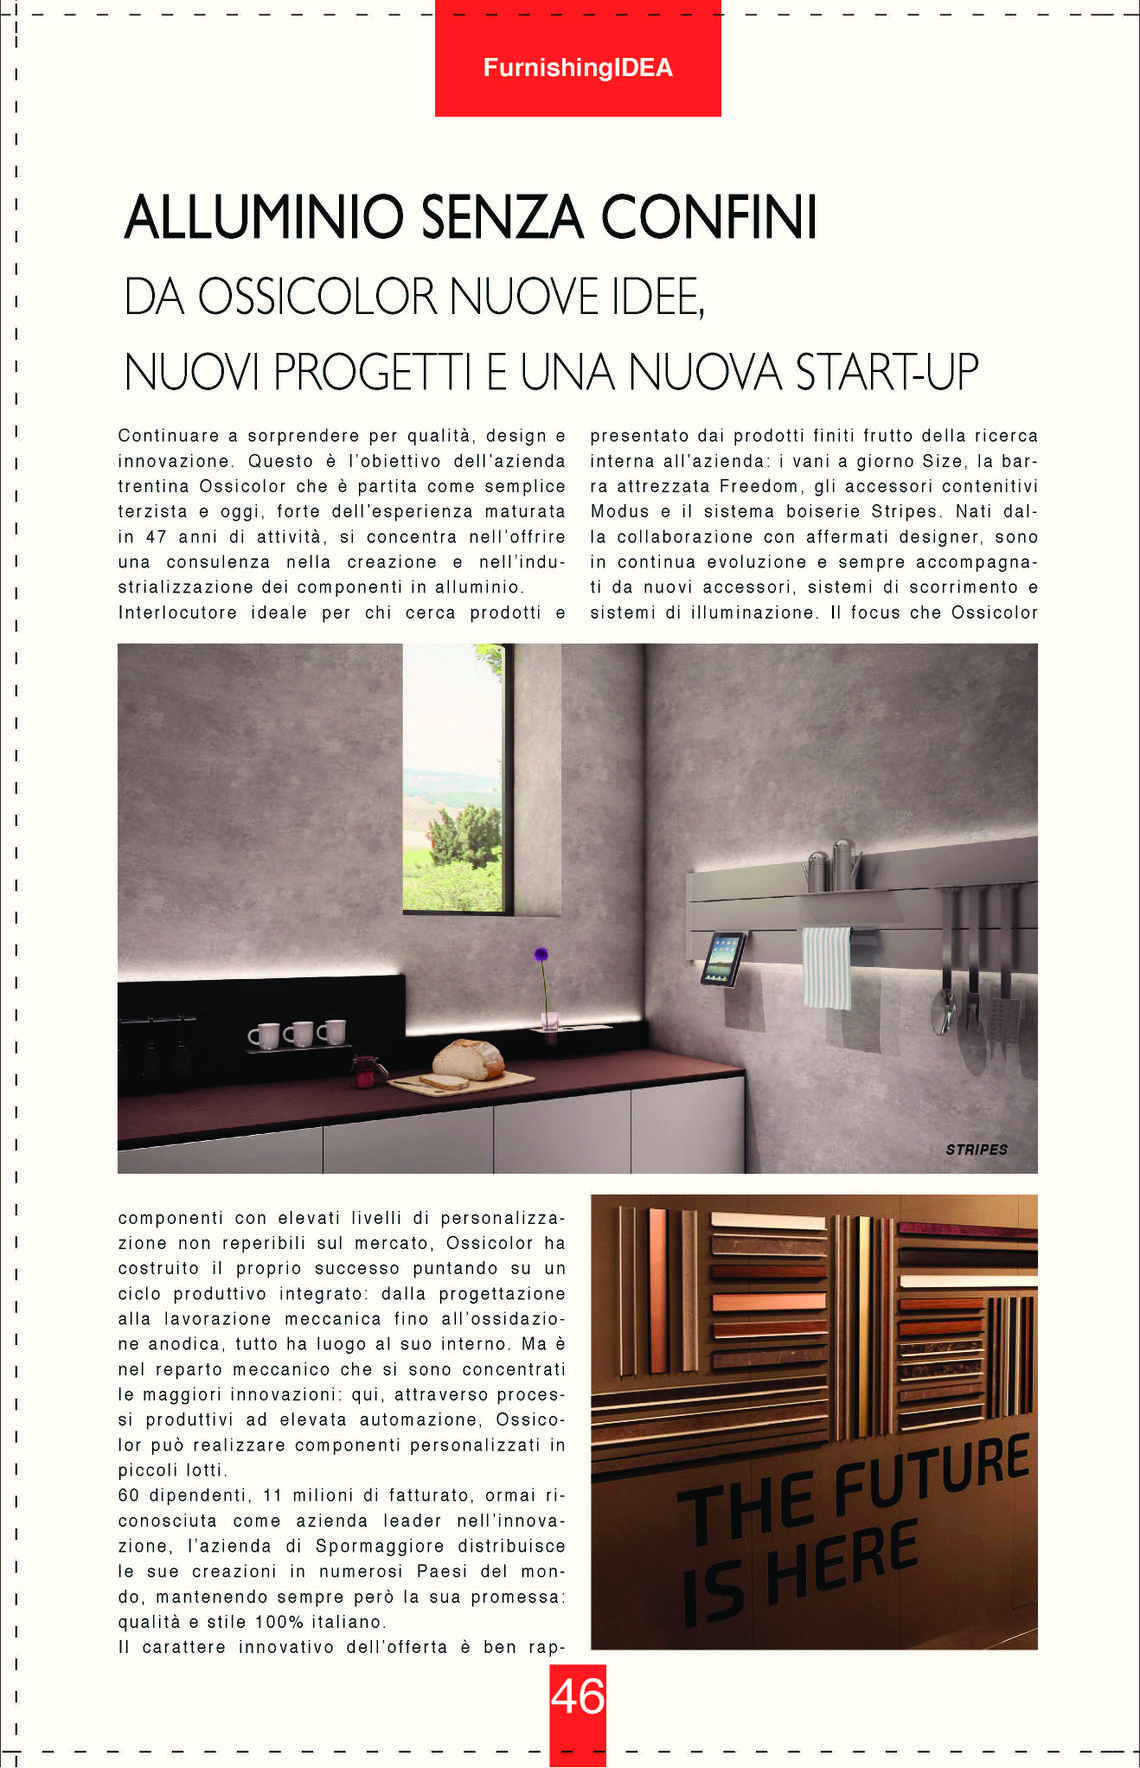 furnishing-idea-journal--1-2018_journal_9_045.jpg